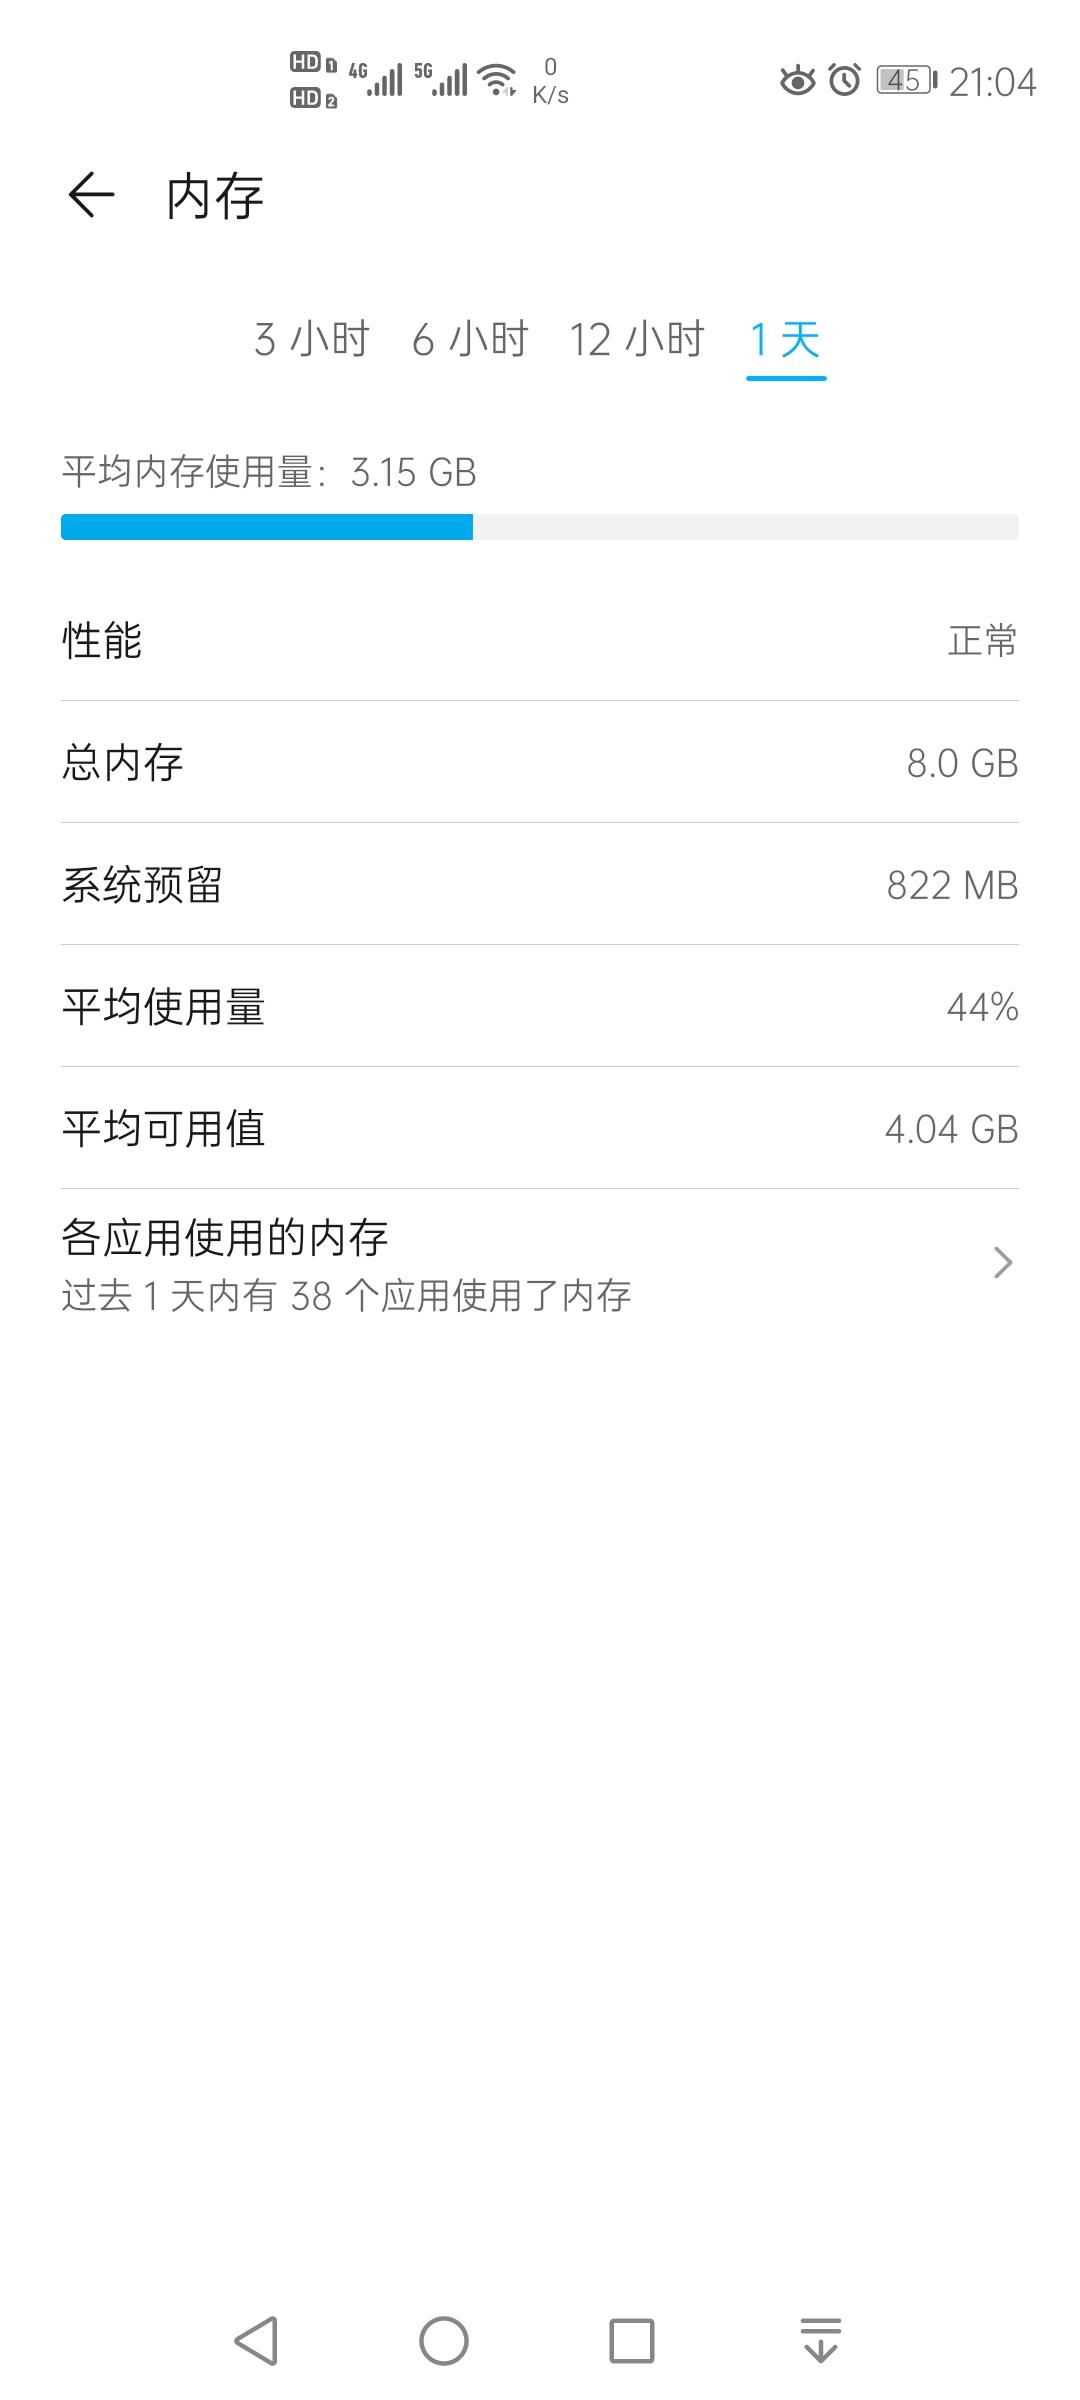 Screenshot_20191221_210424_com.android.settings.jpg